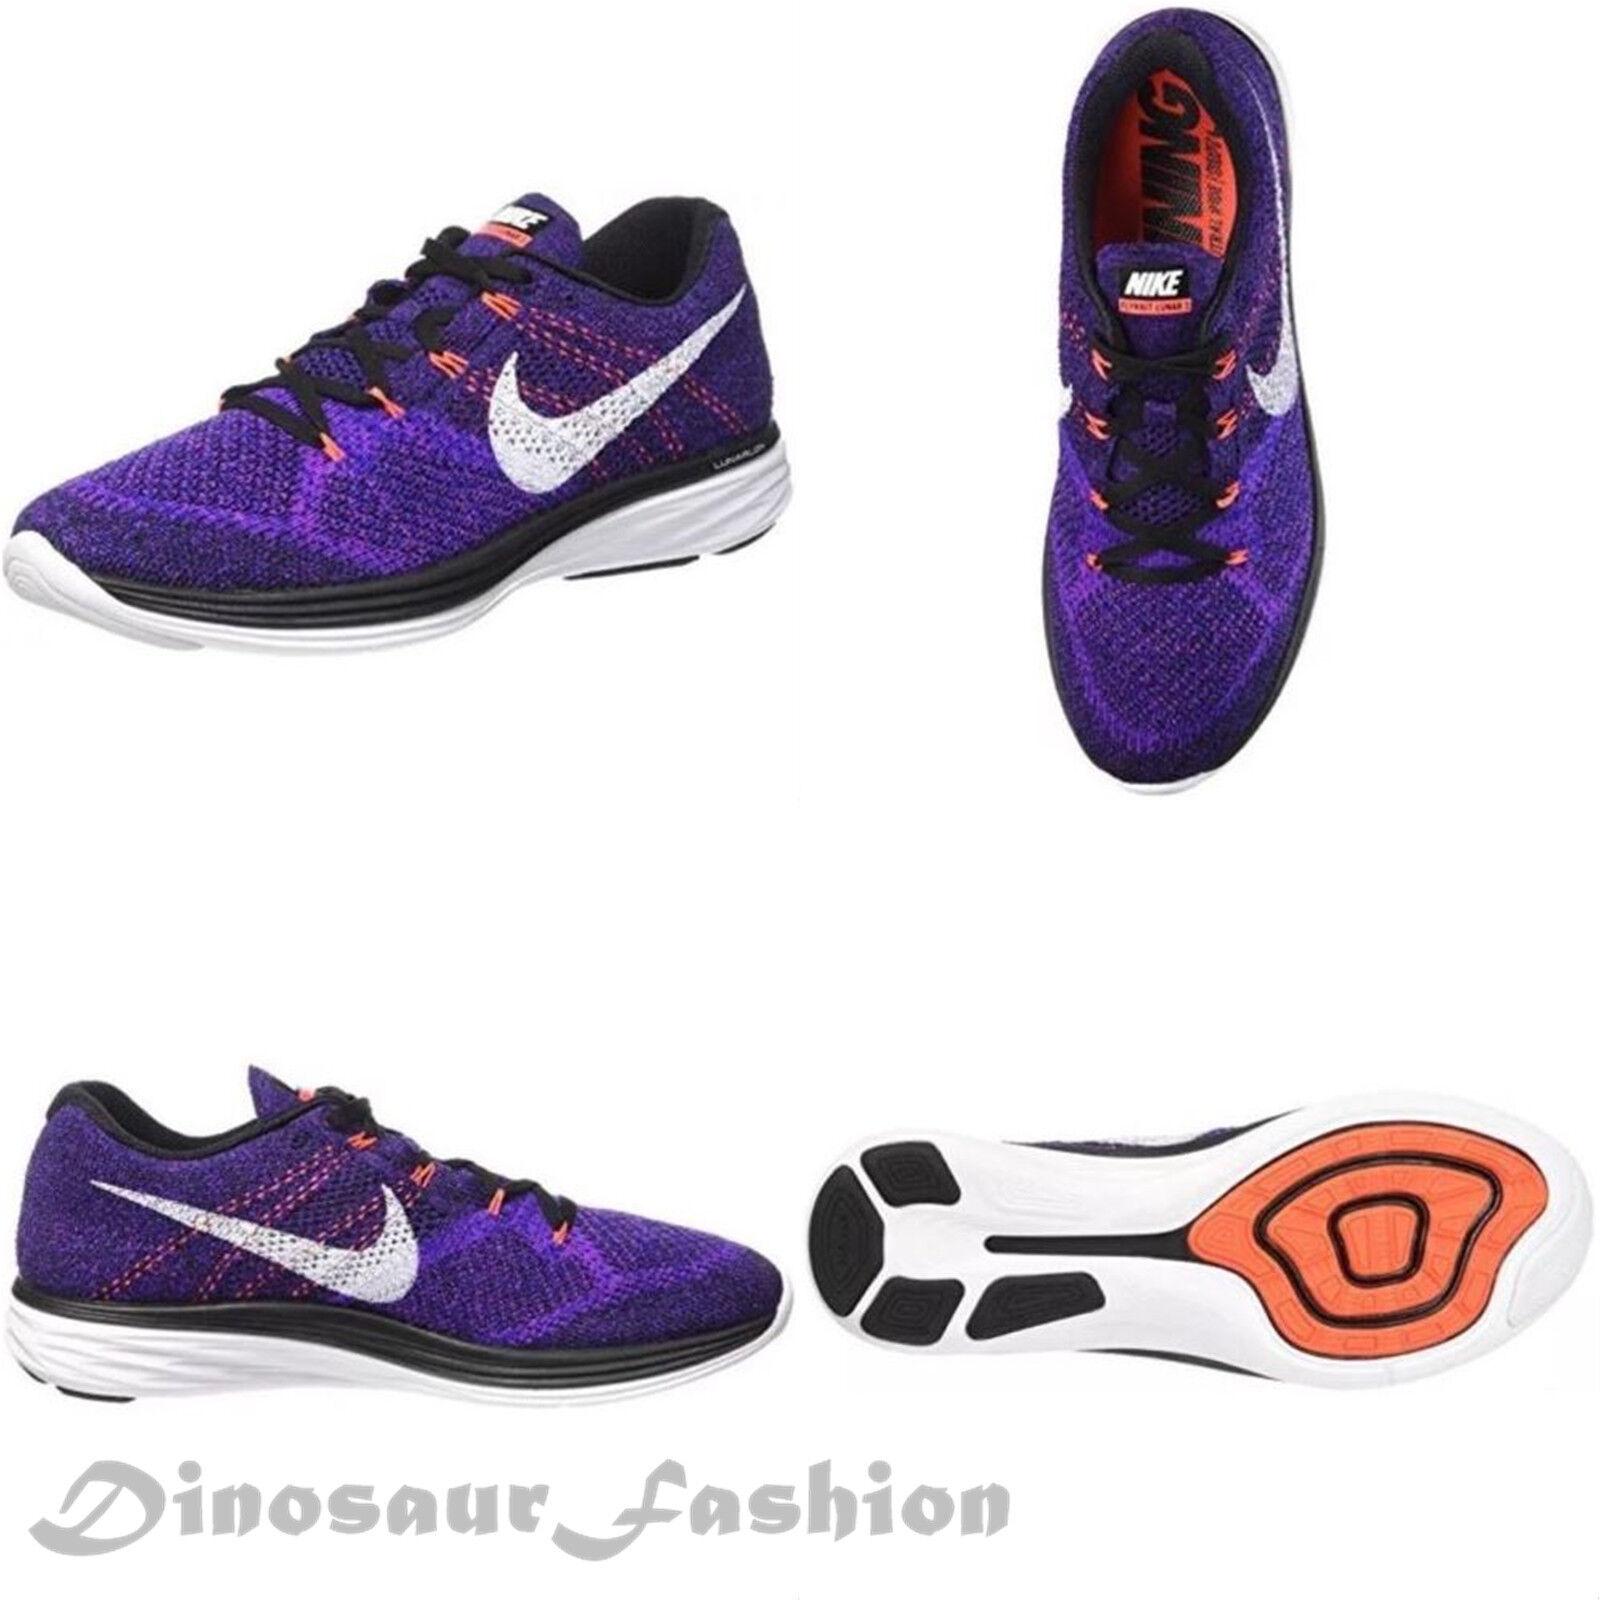 Nike ginnastica flyknit lunar3 698181-014 uomini running-scarpe da ginnastica Nike scarpe nuove con box bc042e